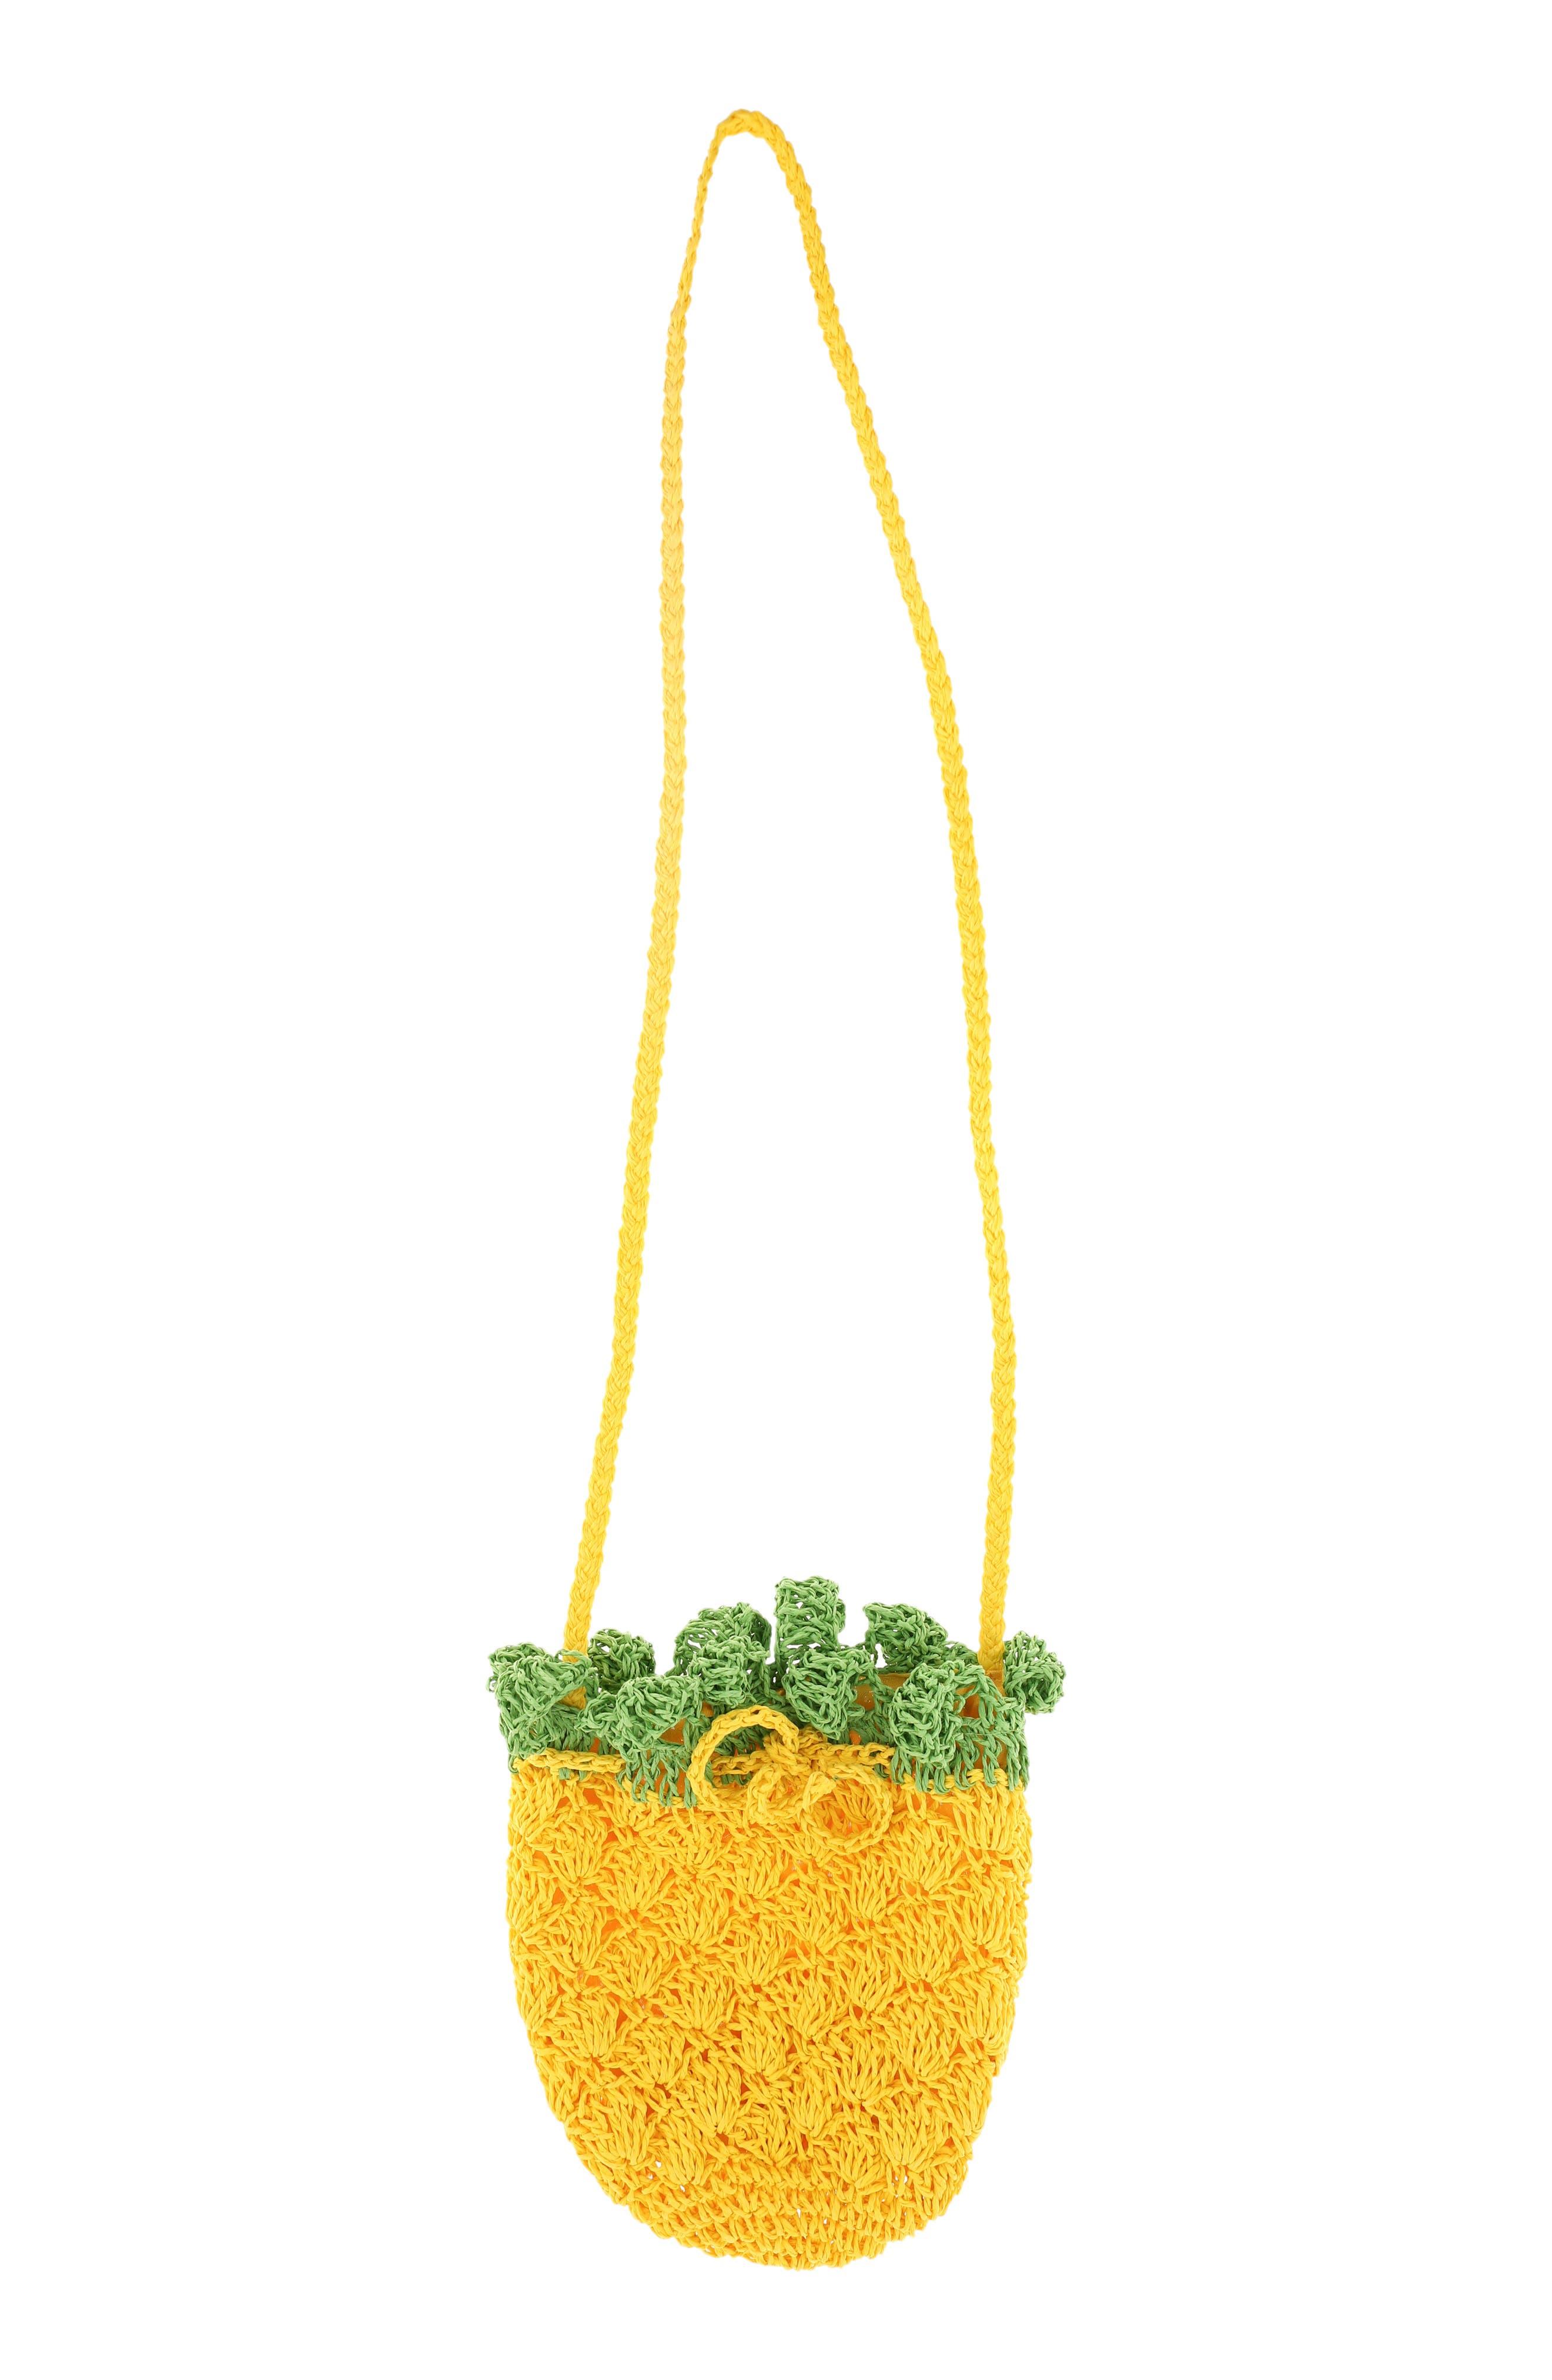 CAPELLI NEW YORK, Crochet Pineapple Crossbody Bag, Alternate thumbnail 4, color, YELLOW COMBO